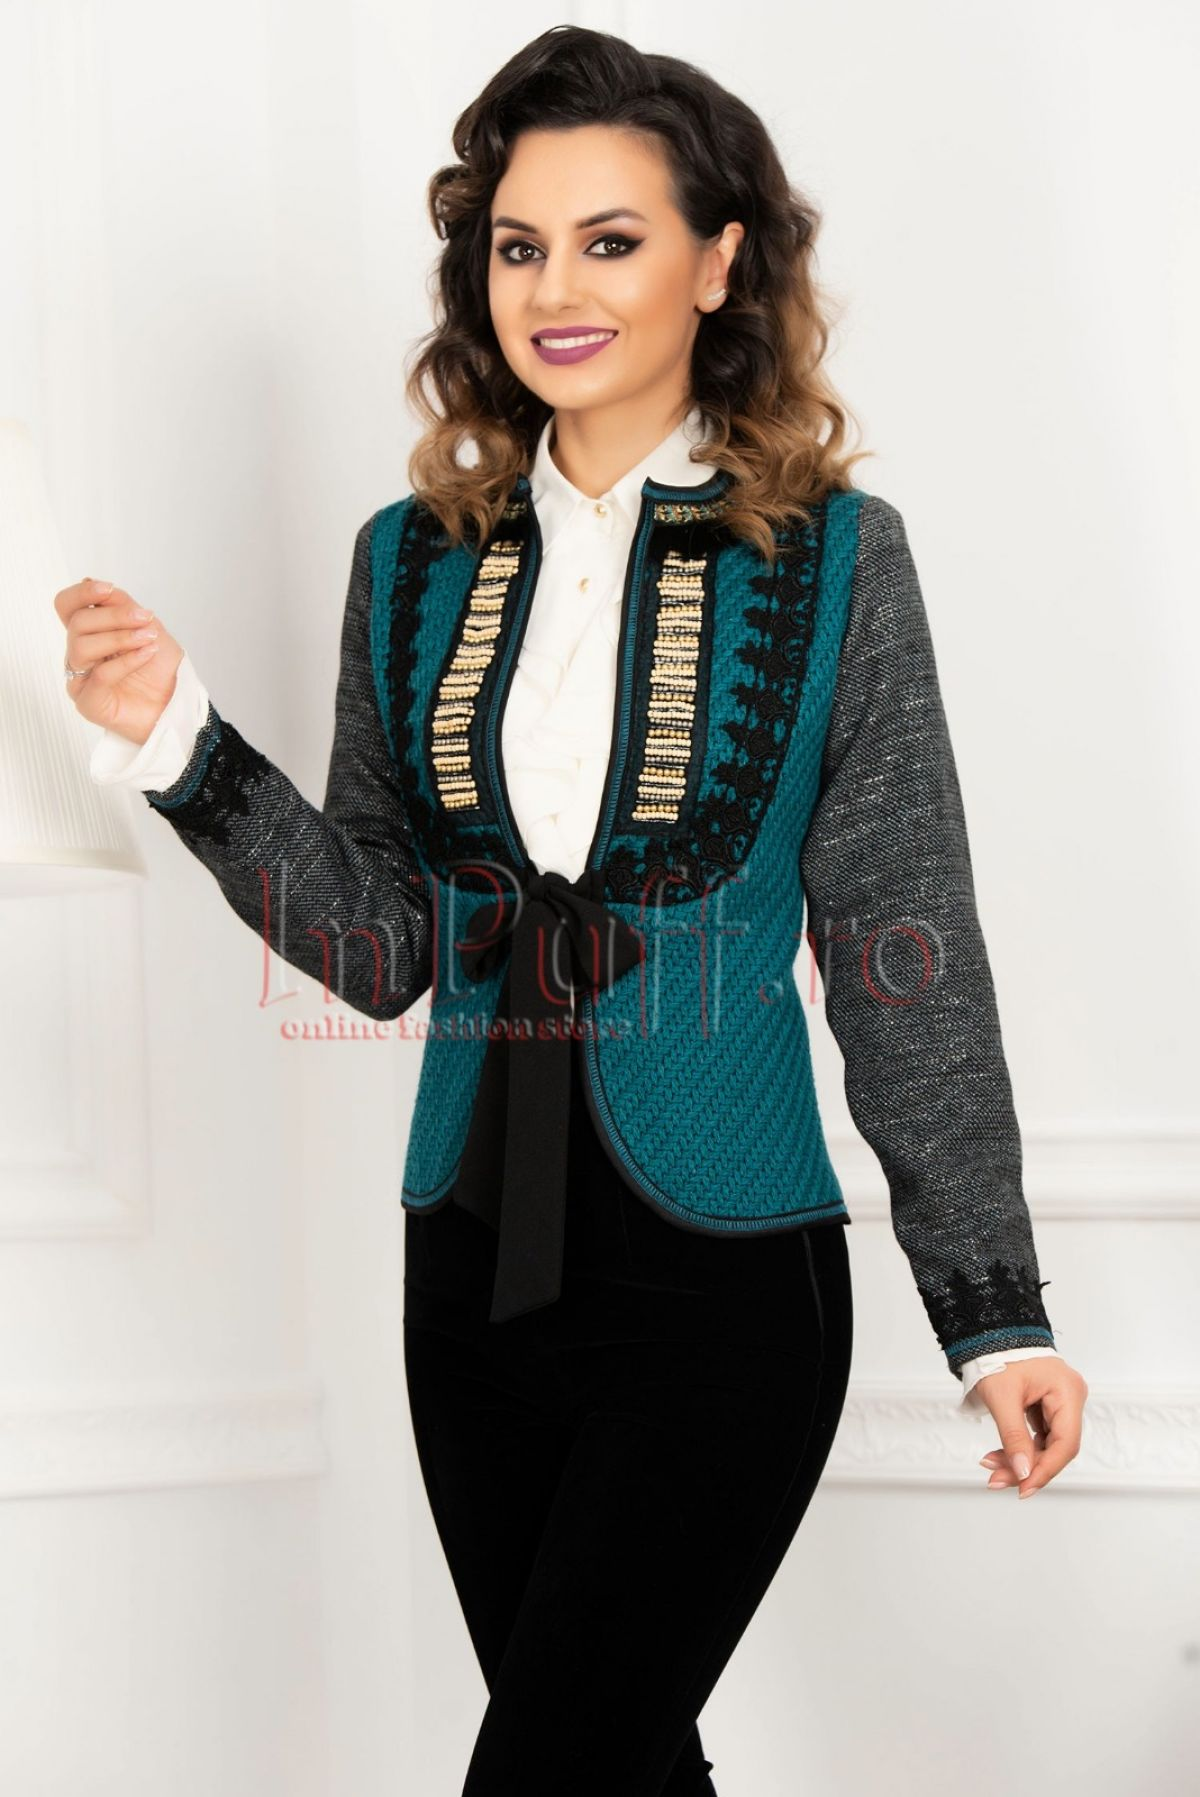 Jacheta albastra cu motive traditionale si broderie